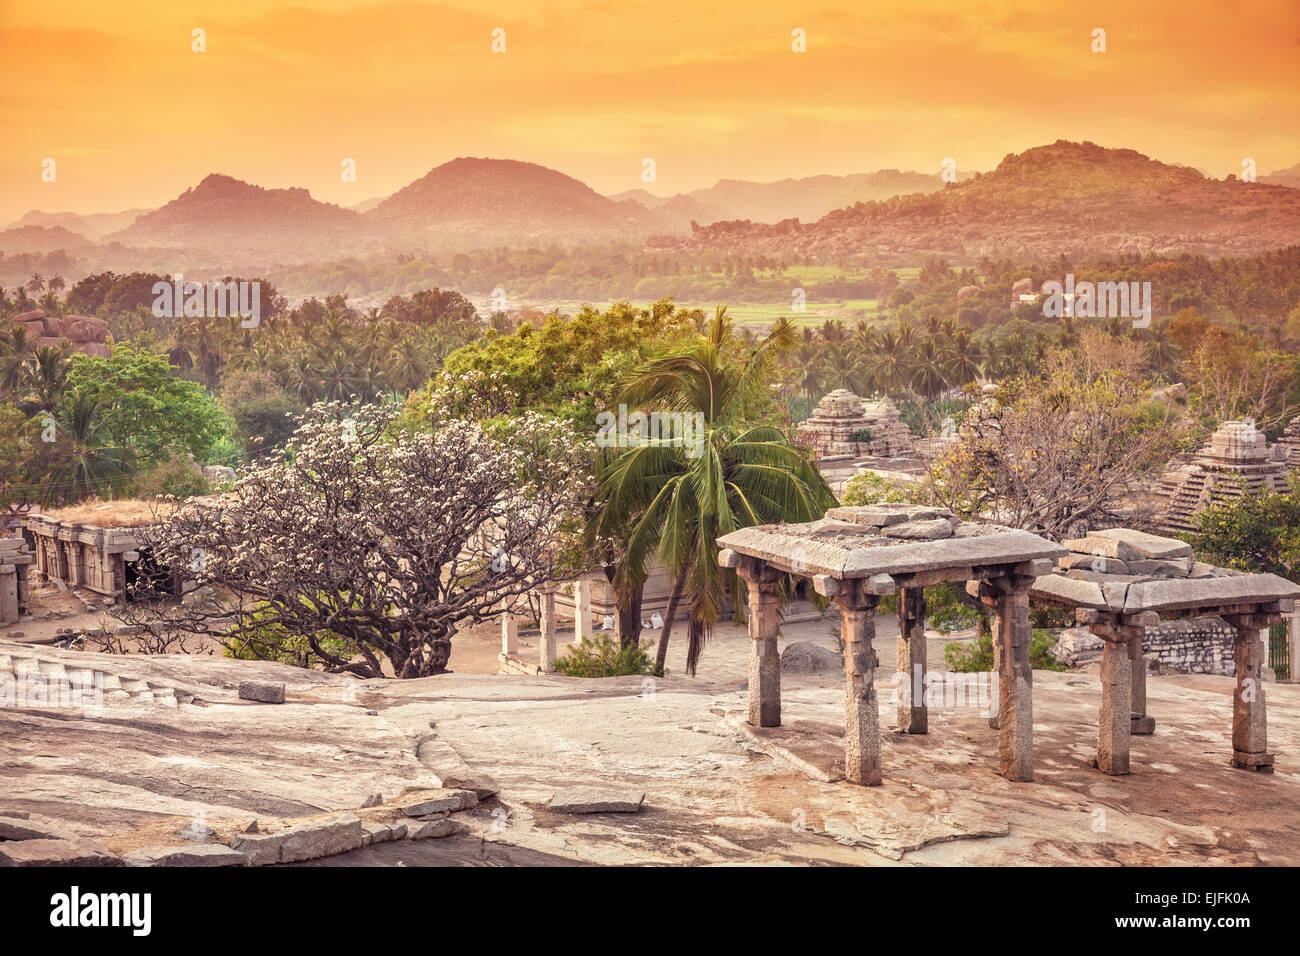 Alte Ruinen auf dem Hügel Hemakuta in orange sunset Himmel in Hampi, Karnataka, Indien Stockbild